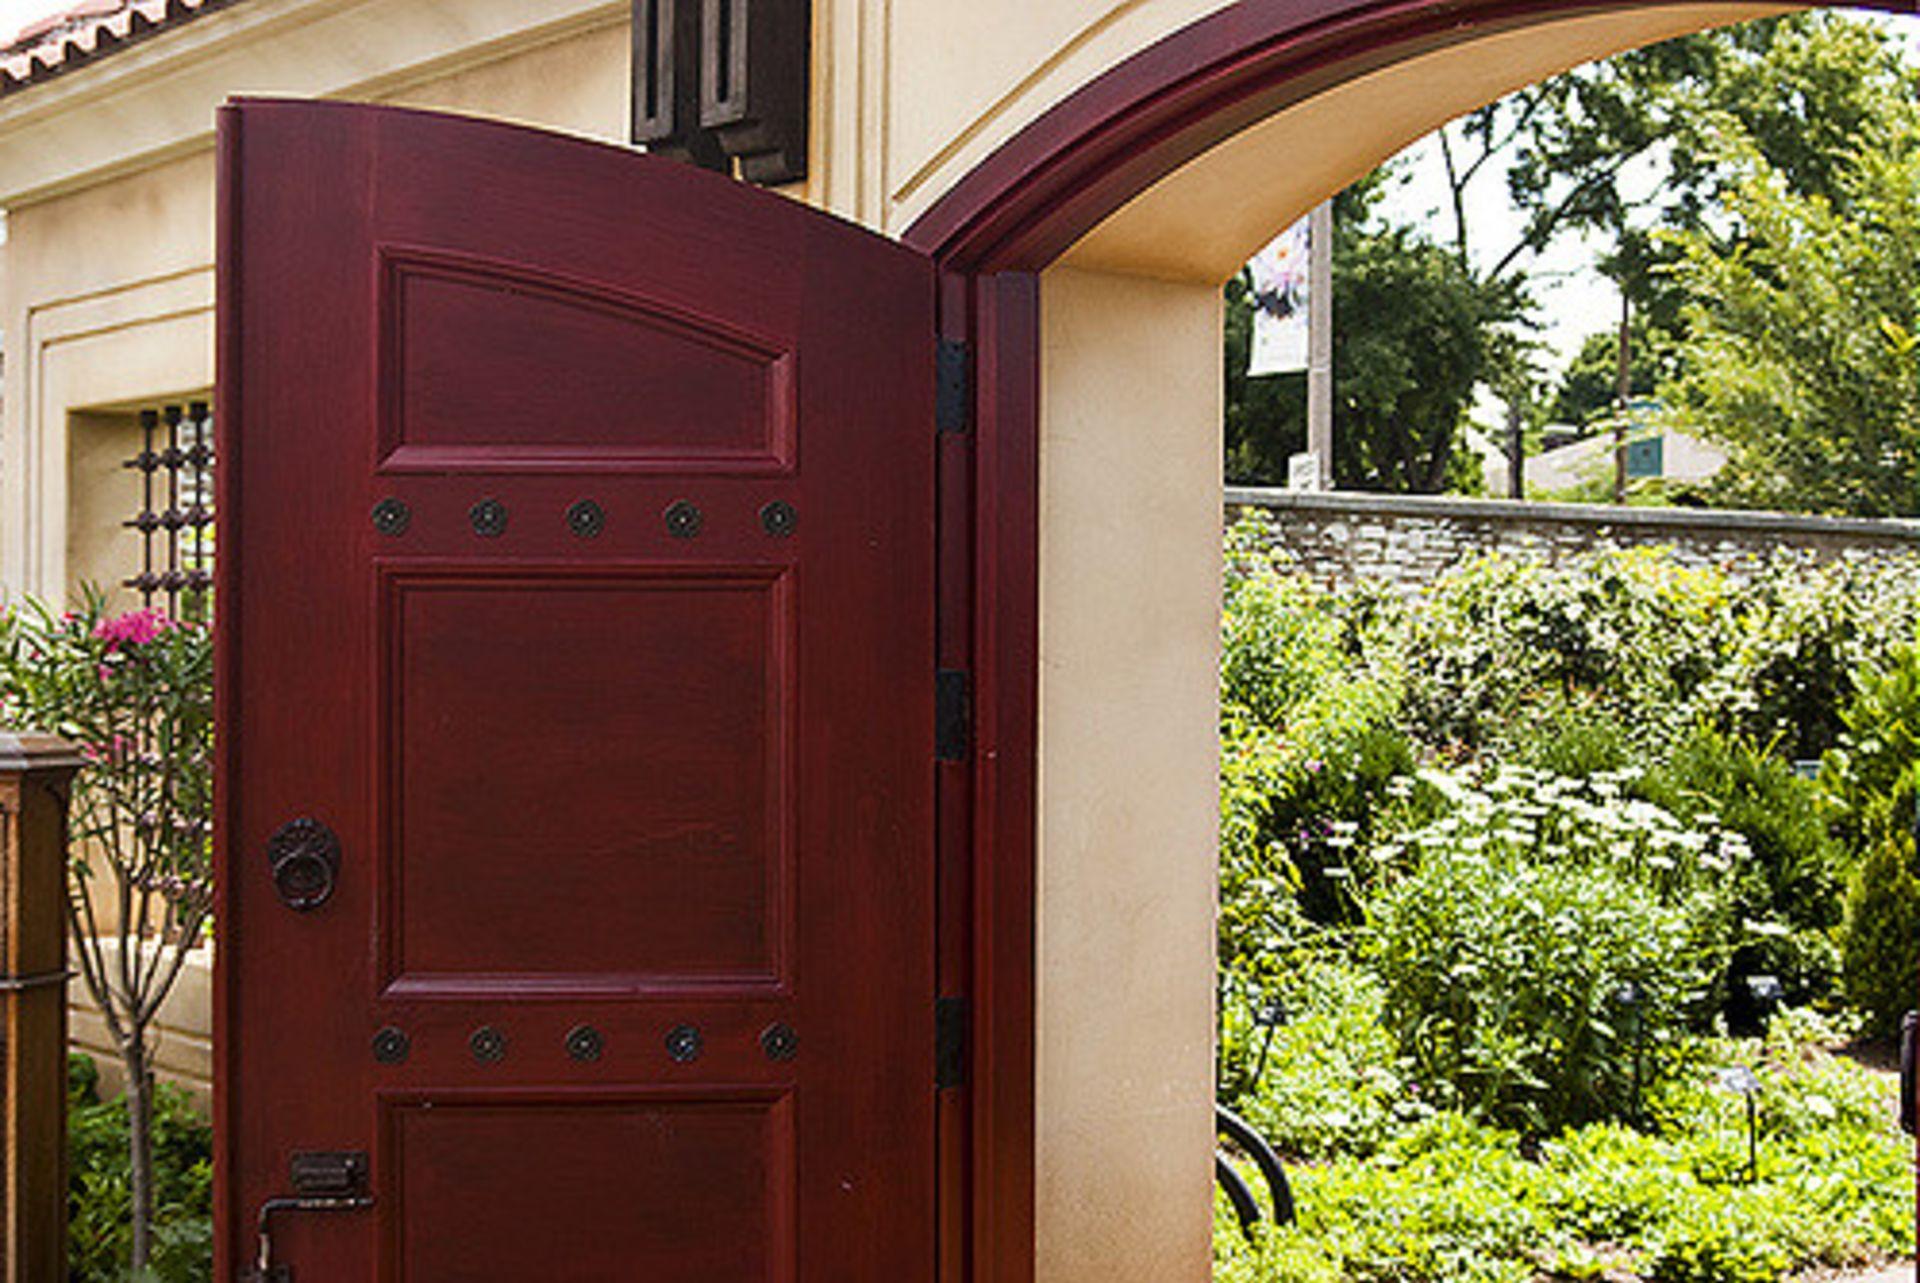 Isn't That 'A Door Able'?